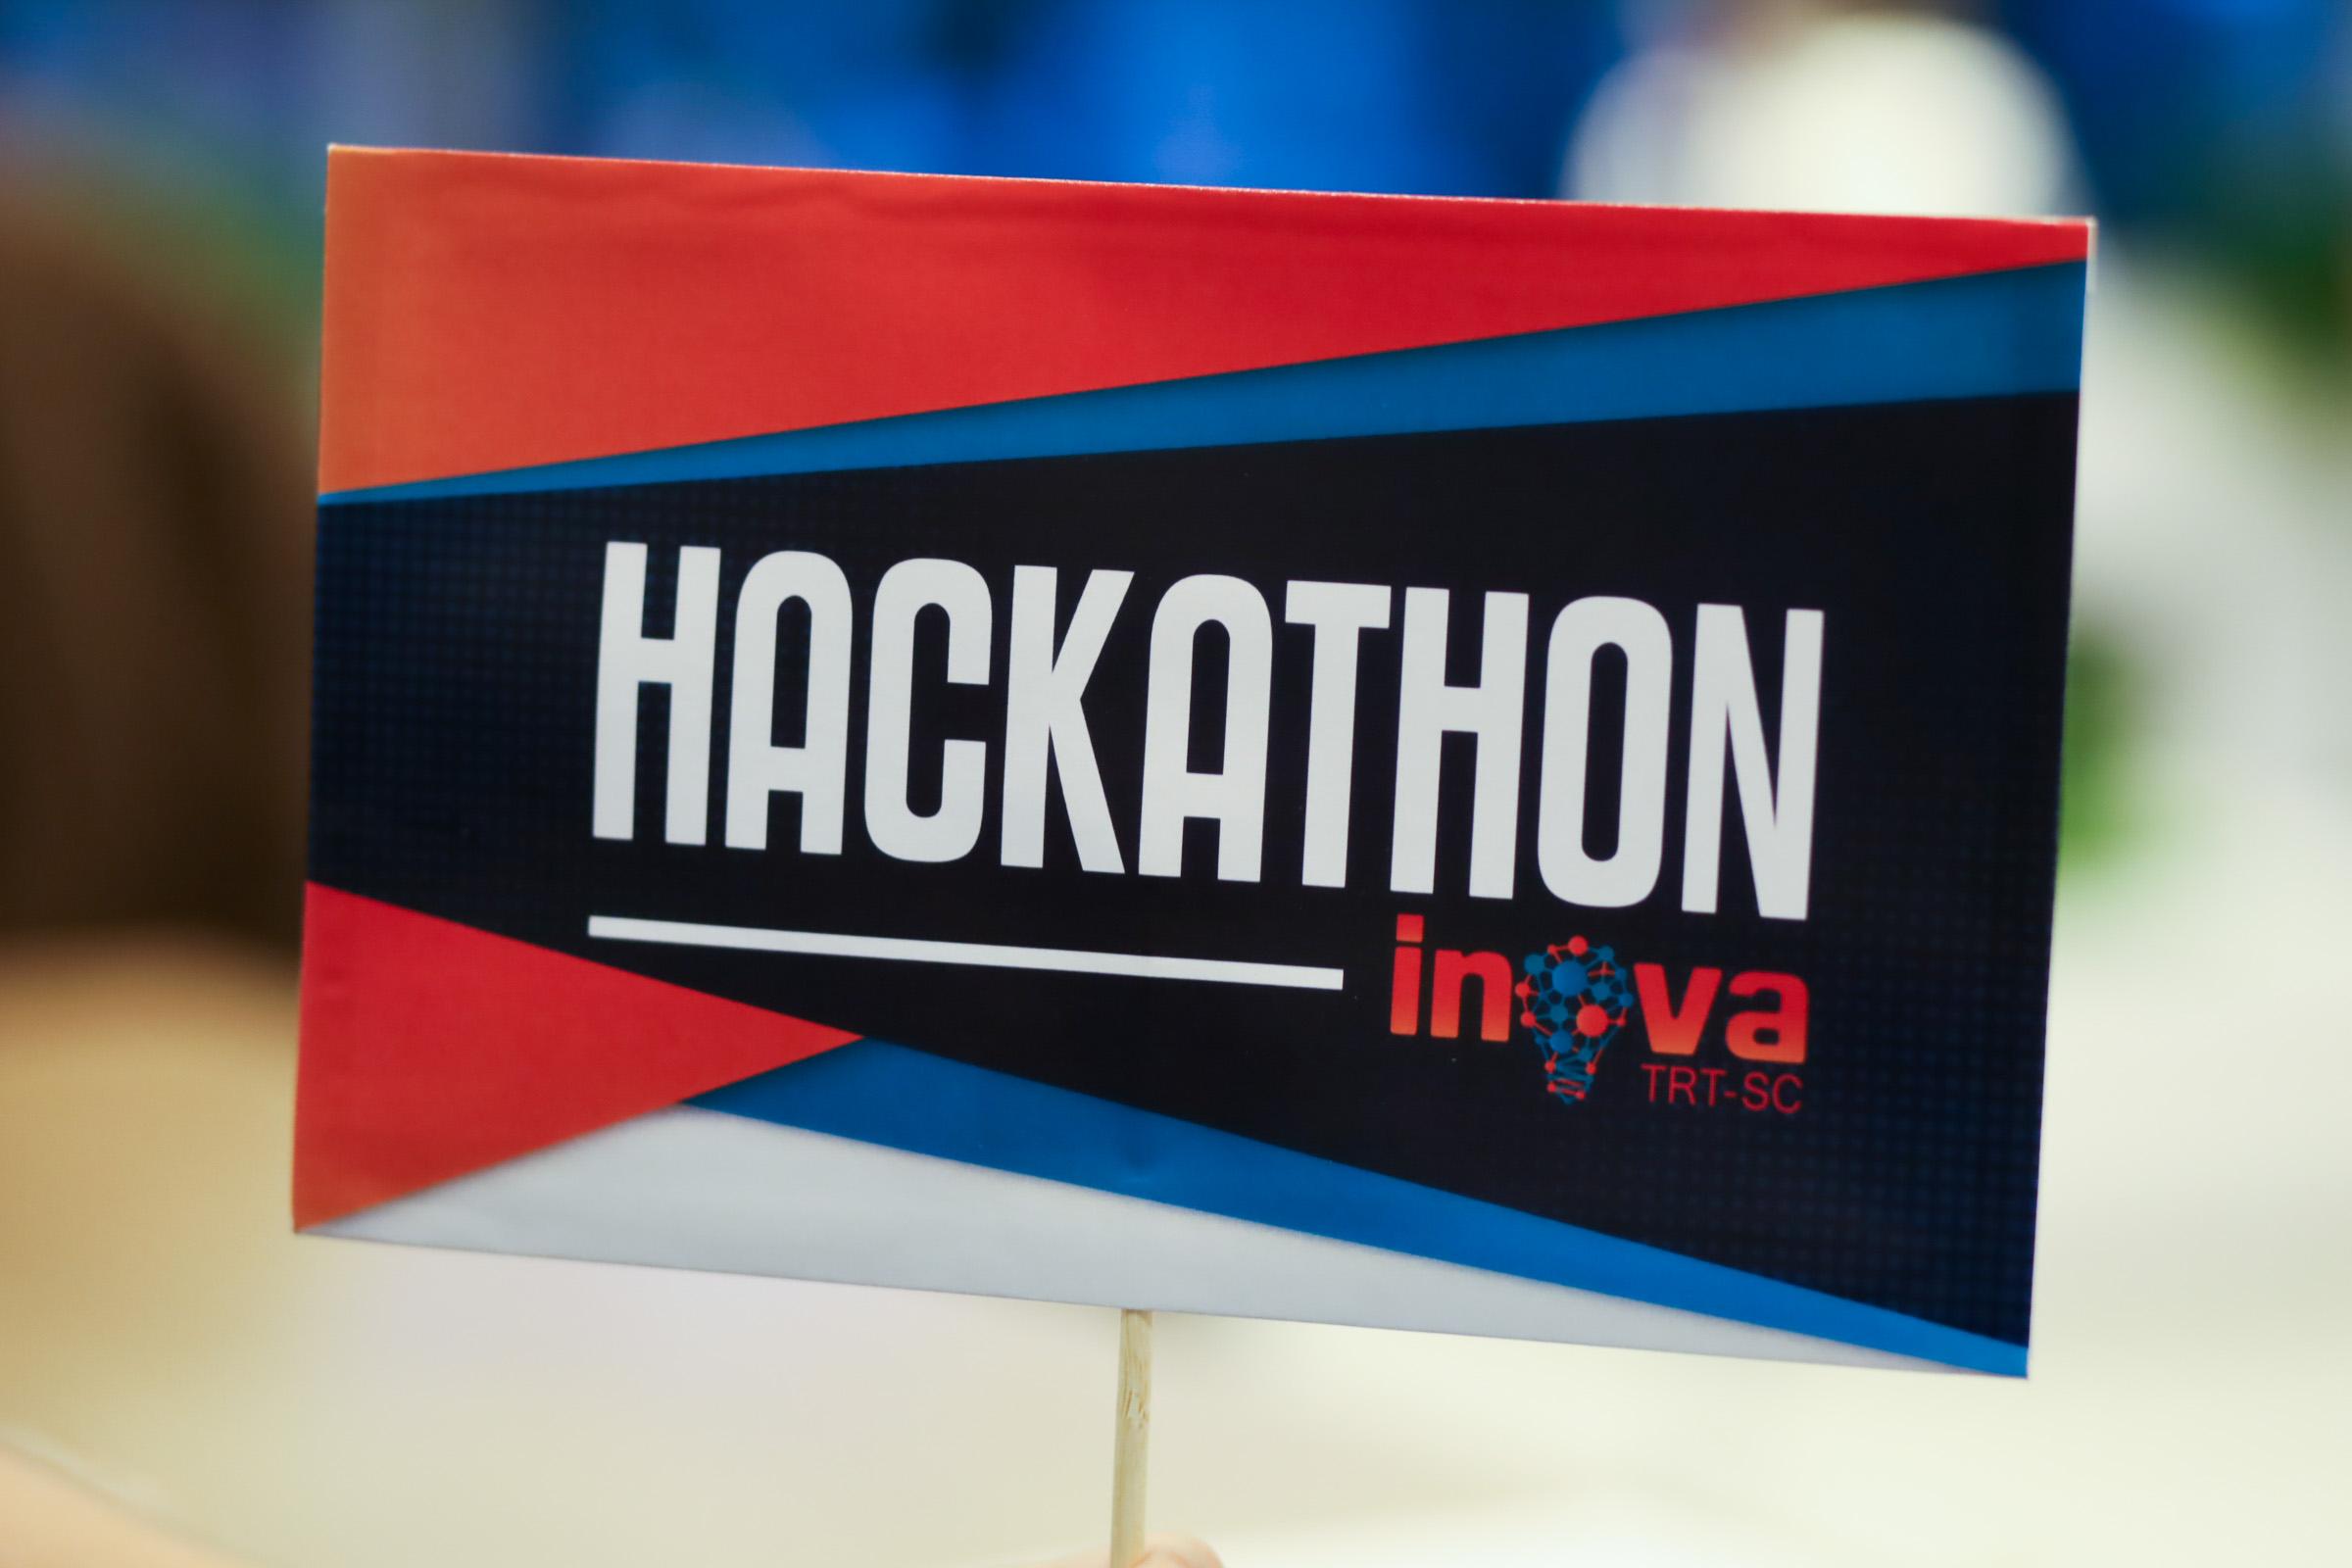 Hackhaton Inova Trt Placa